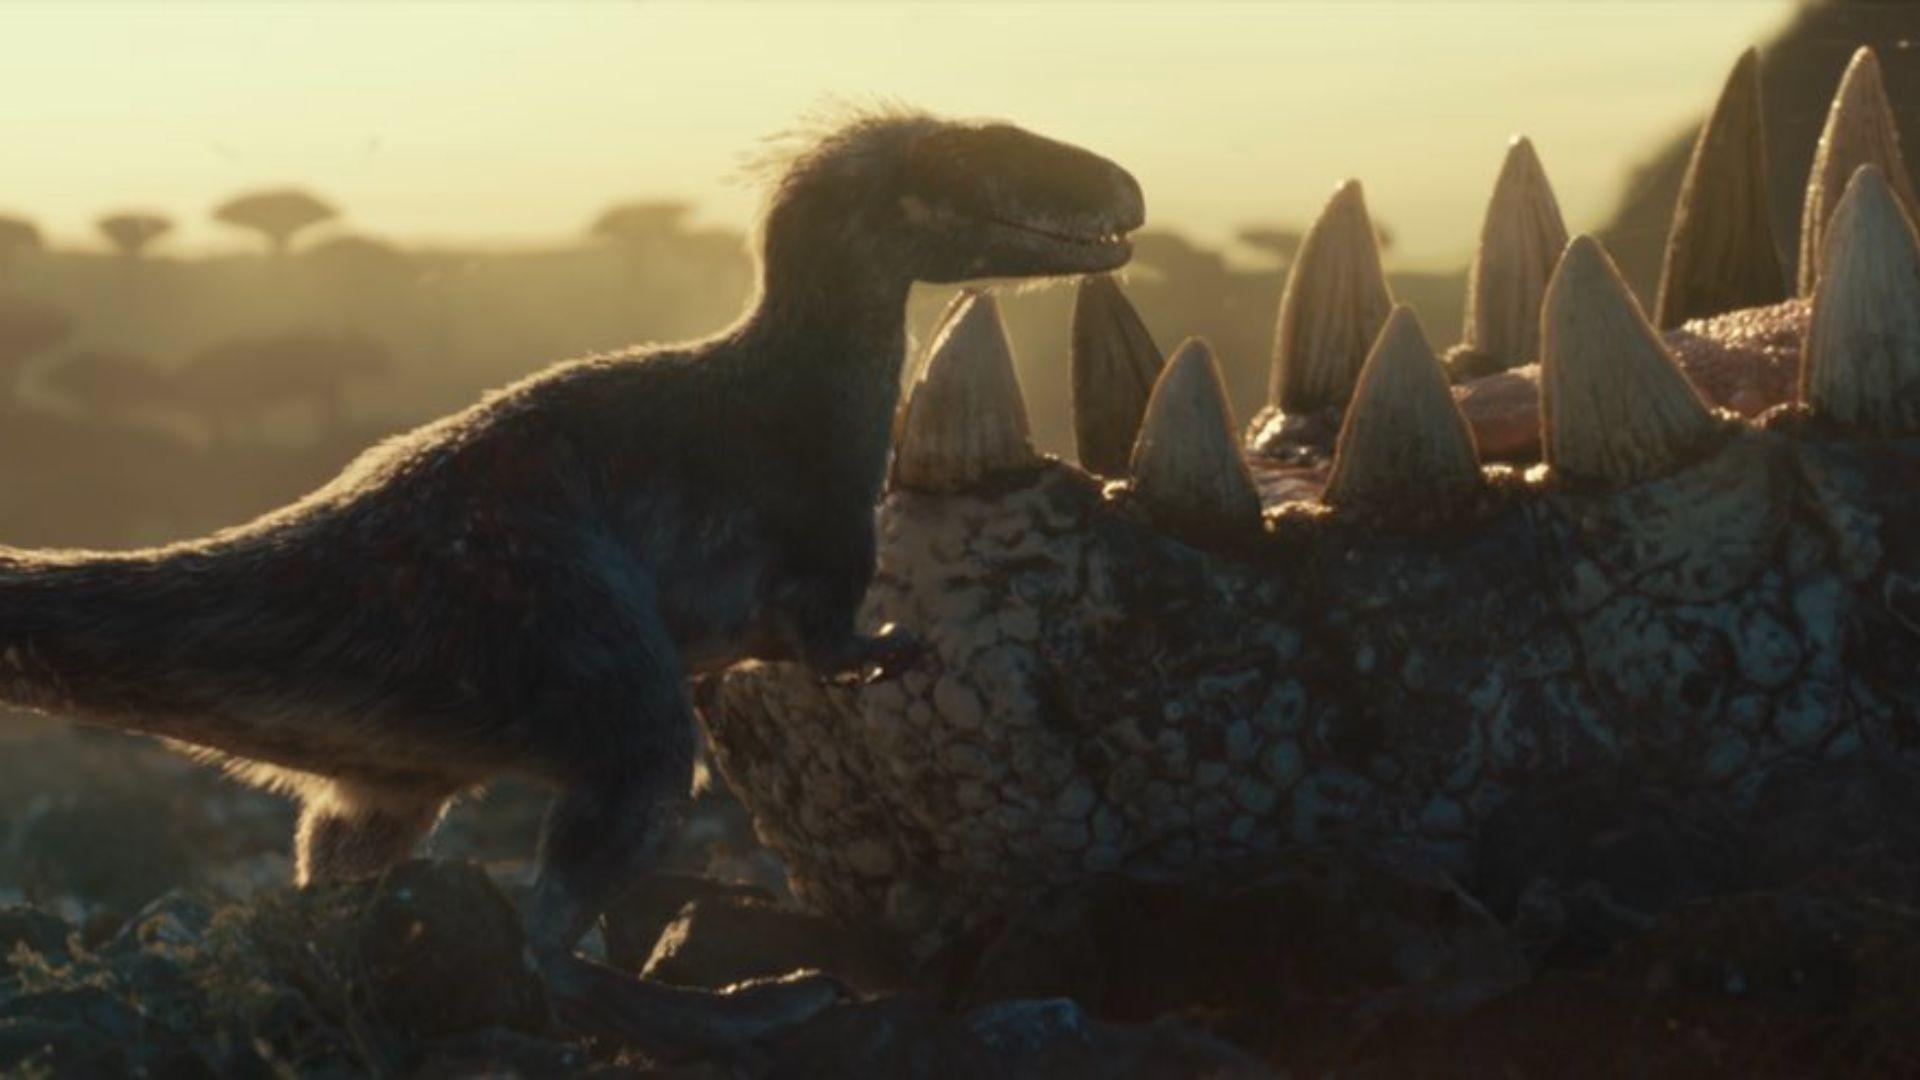 Jurassic World 3: Dominion: release date, trailer, cast, plot, and more    GamesRadar+